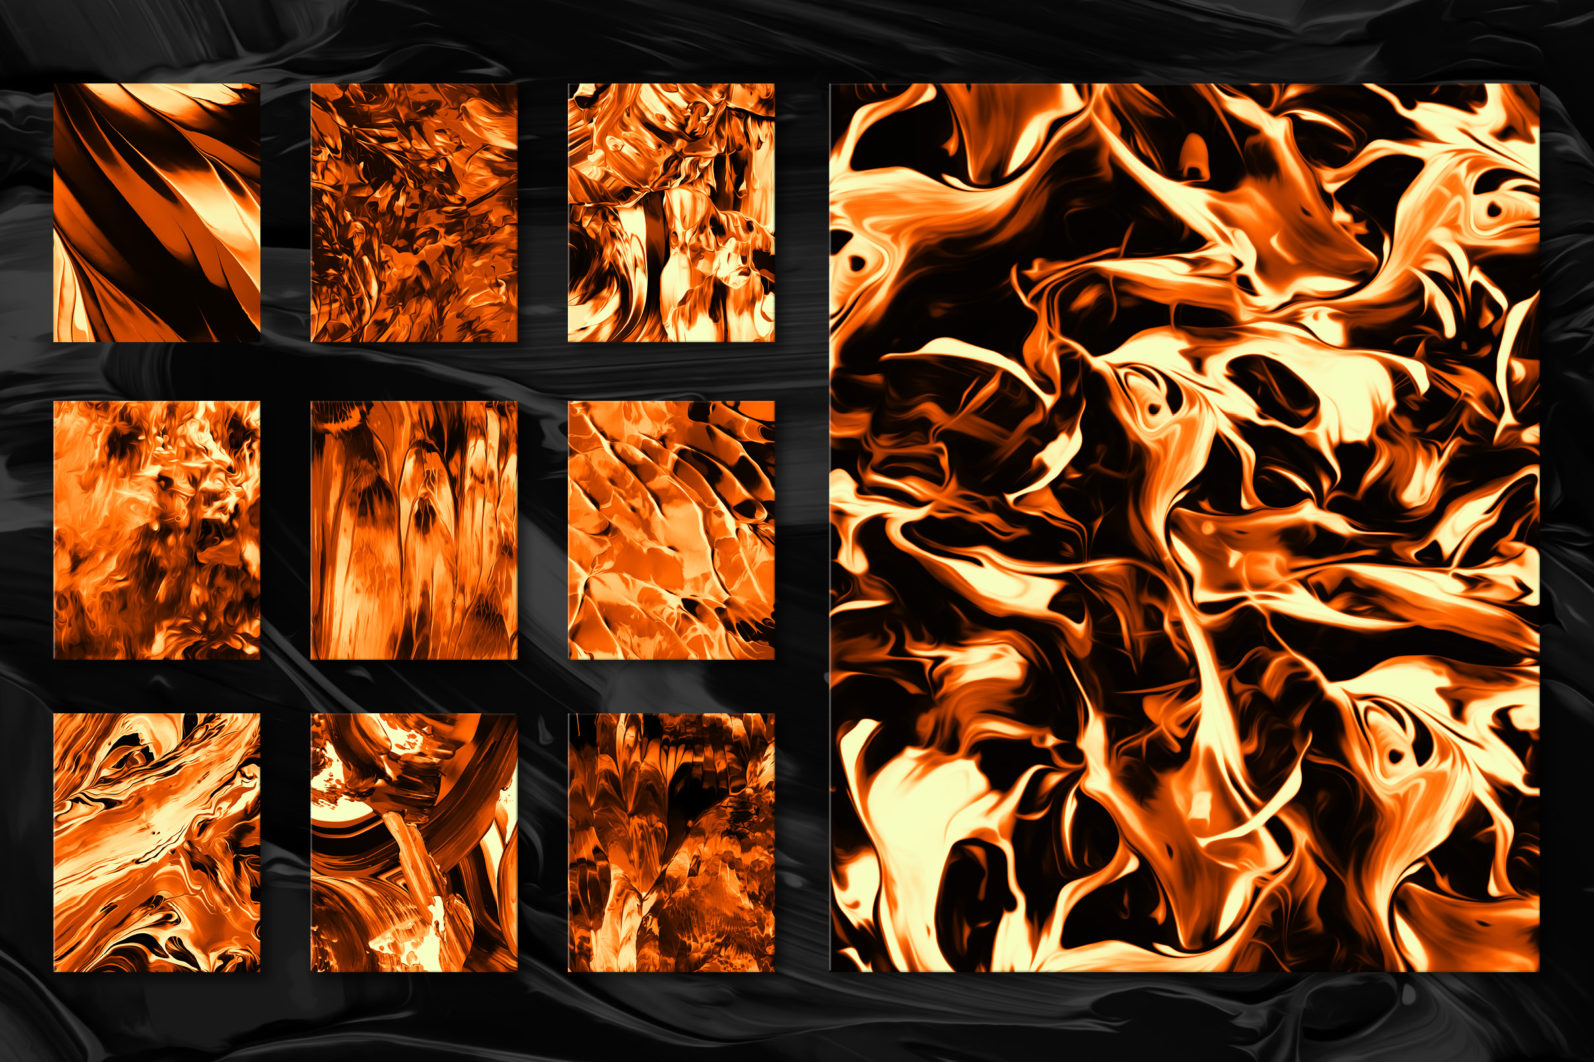 Flow, Vol. 2: 100 Smooth Paint Textures - Flow Vol 2 Preview 09 -